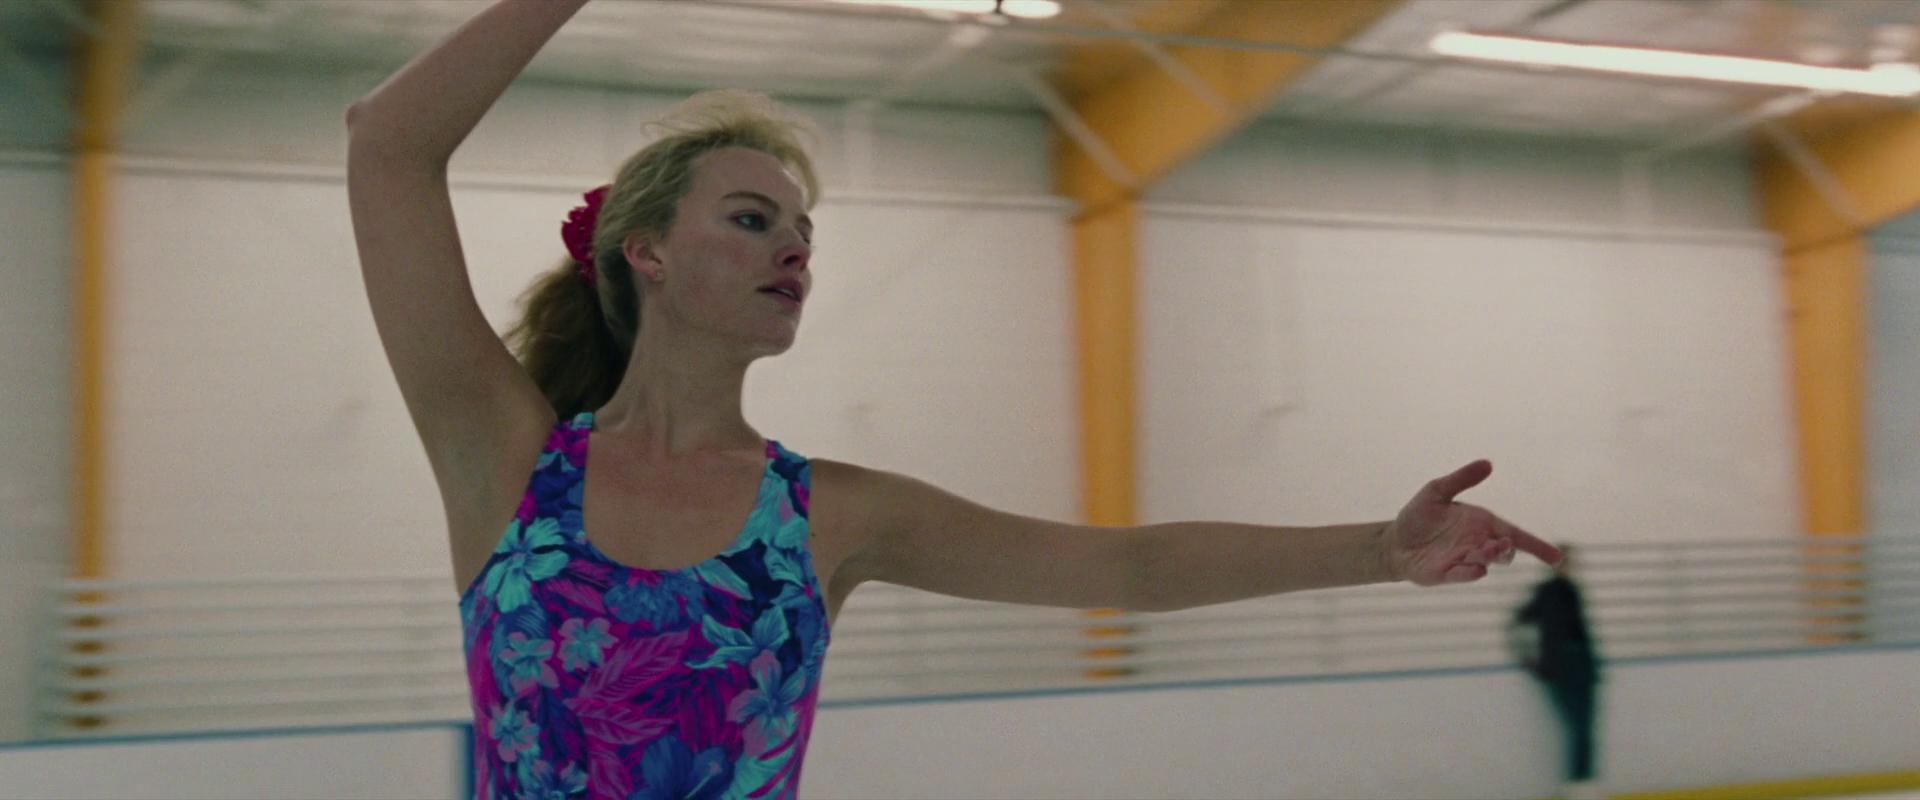 Margot Robbie in I, Tonya (2017)